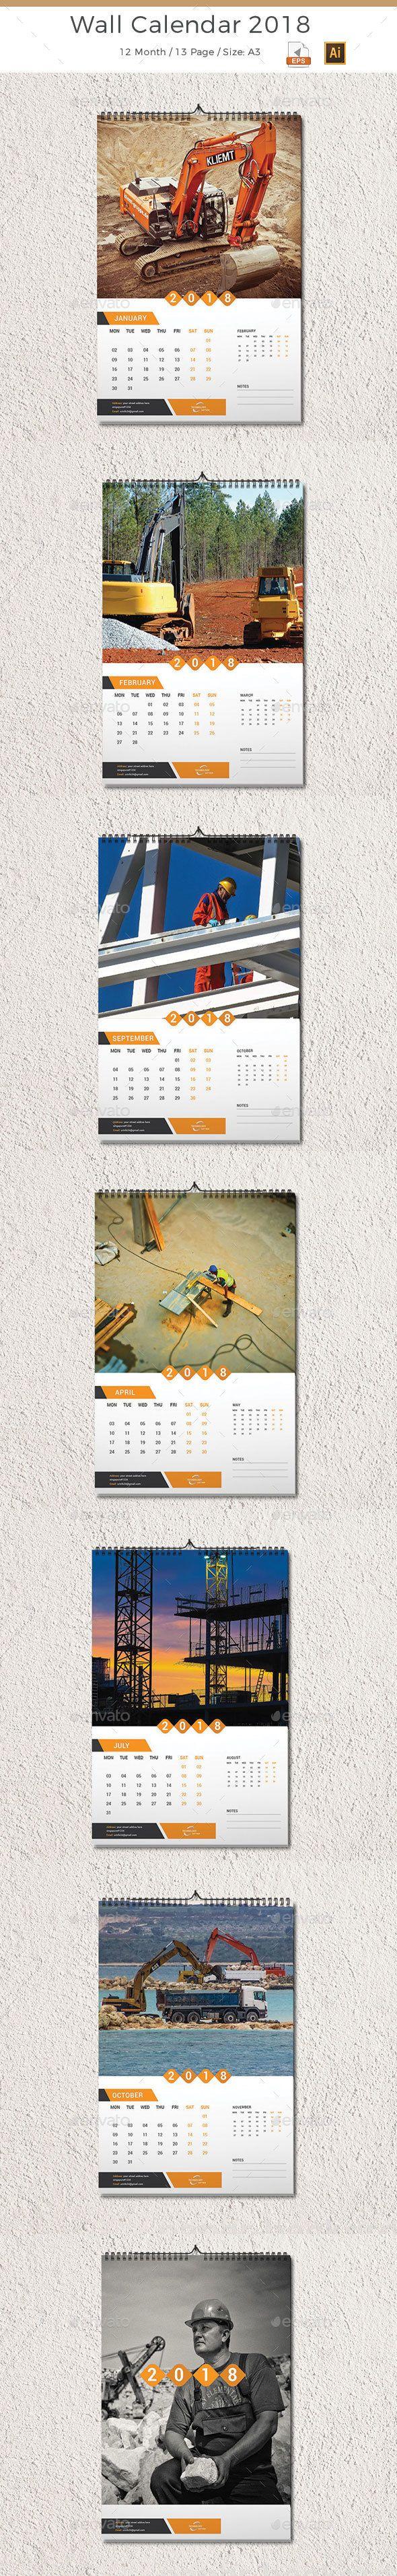 Wall Calendar 2018 - #Calendars #Stationery Download here: https://graphicriver.net/item/wall-calendar-2018/19995961?ref=alena994